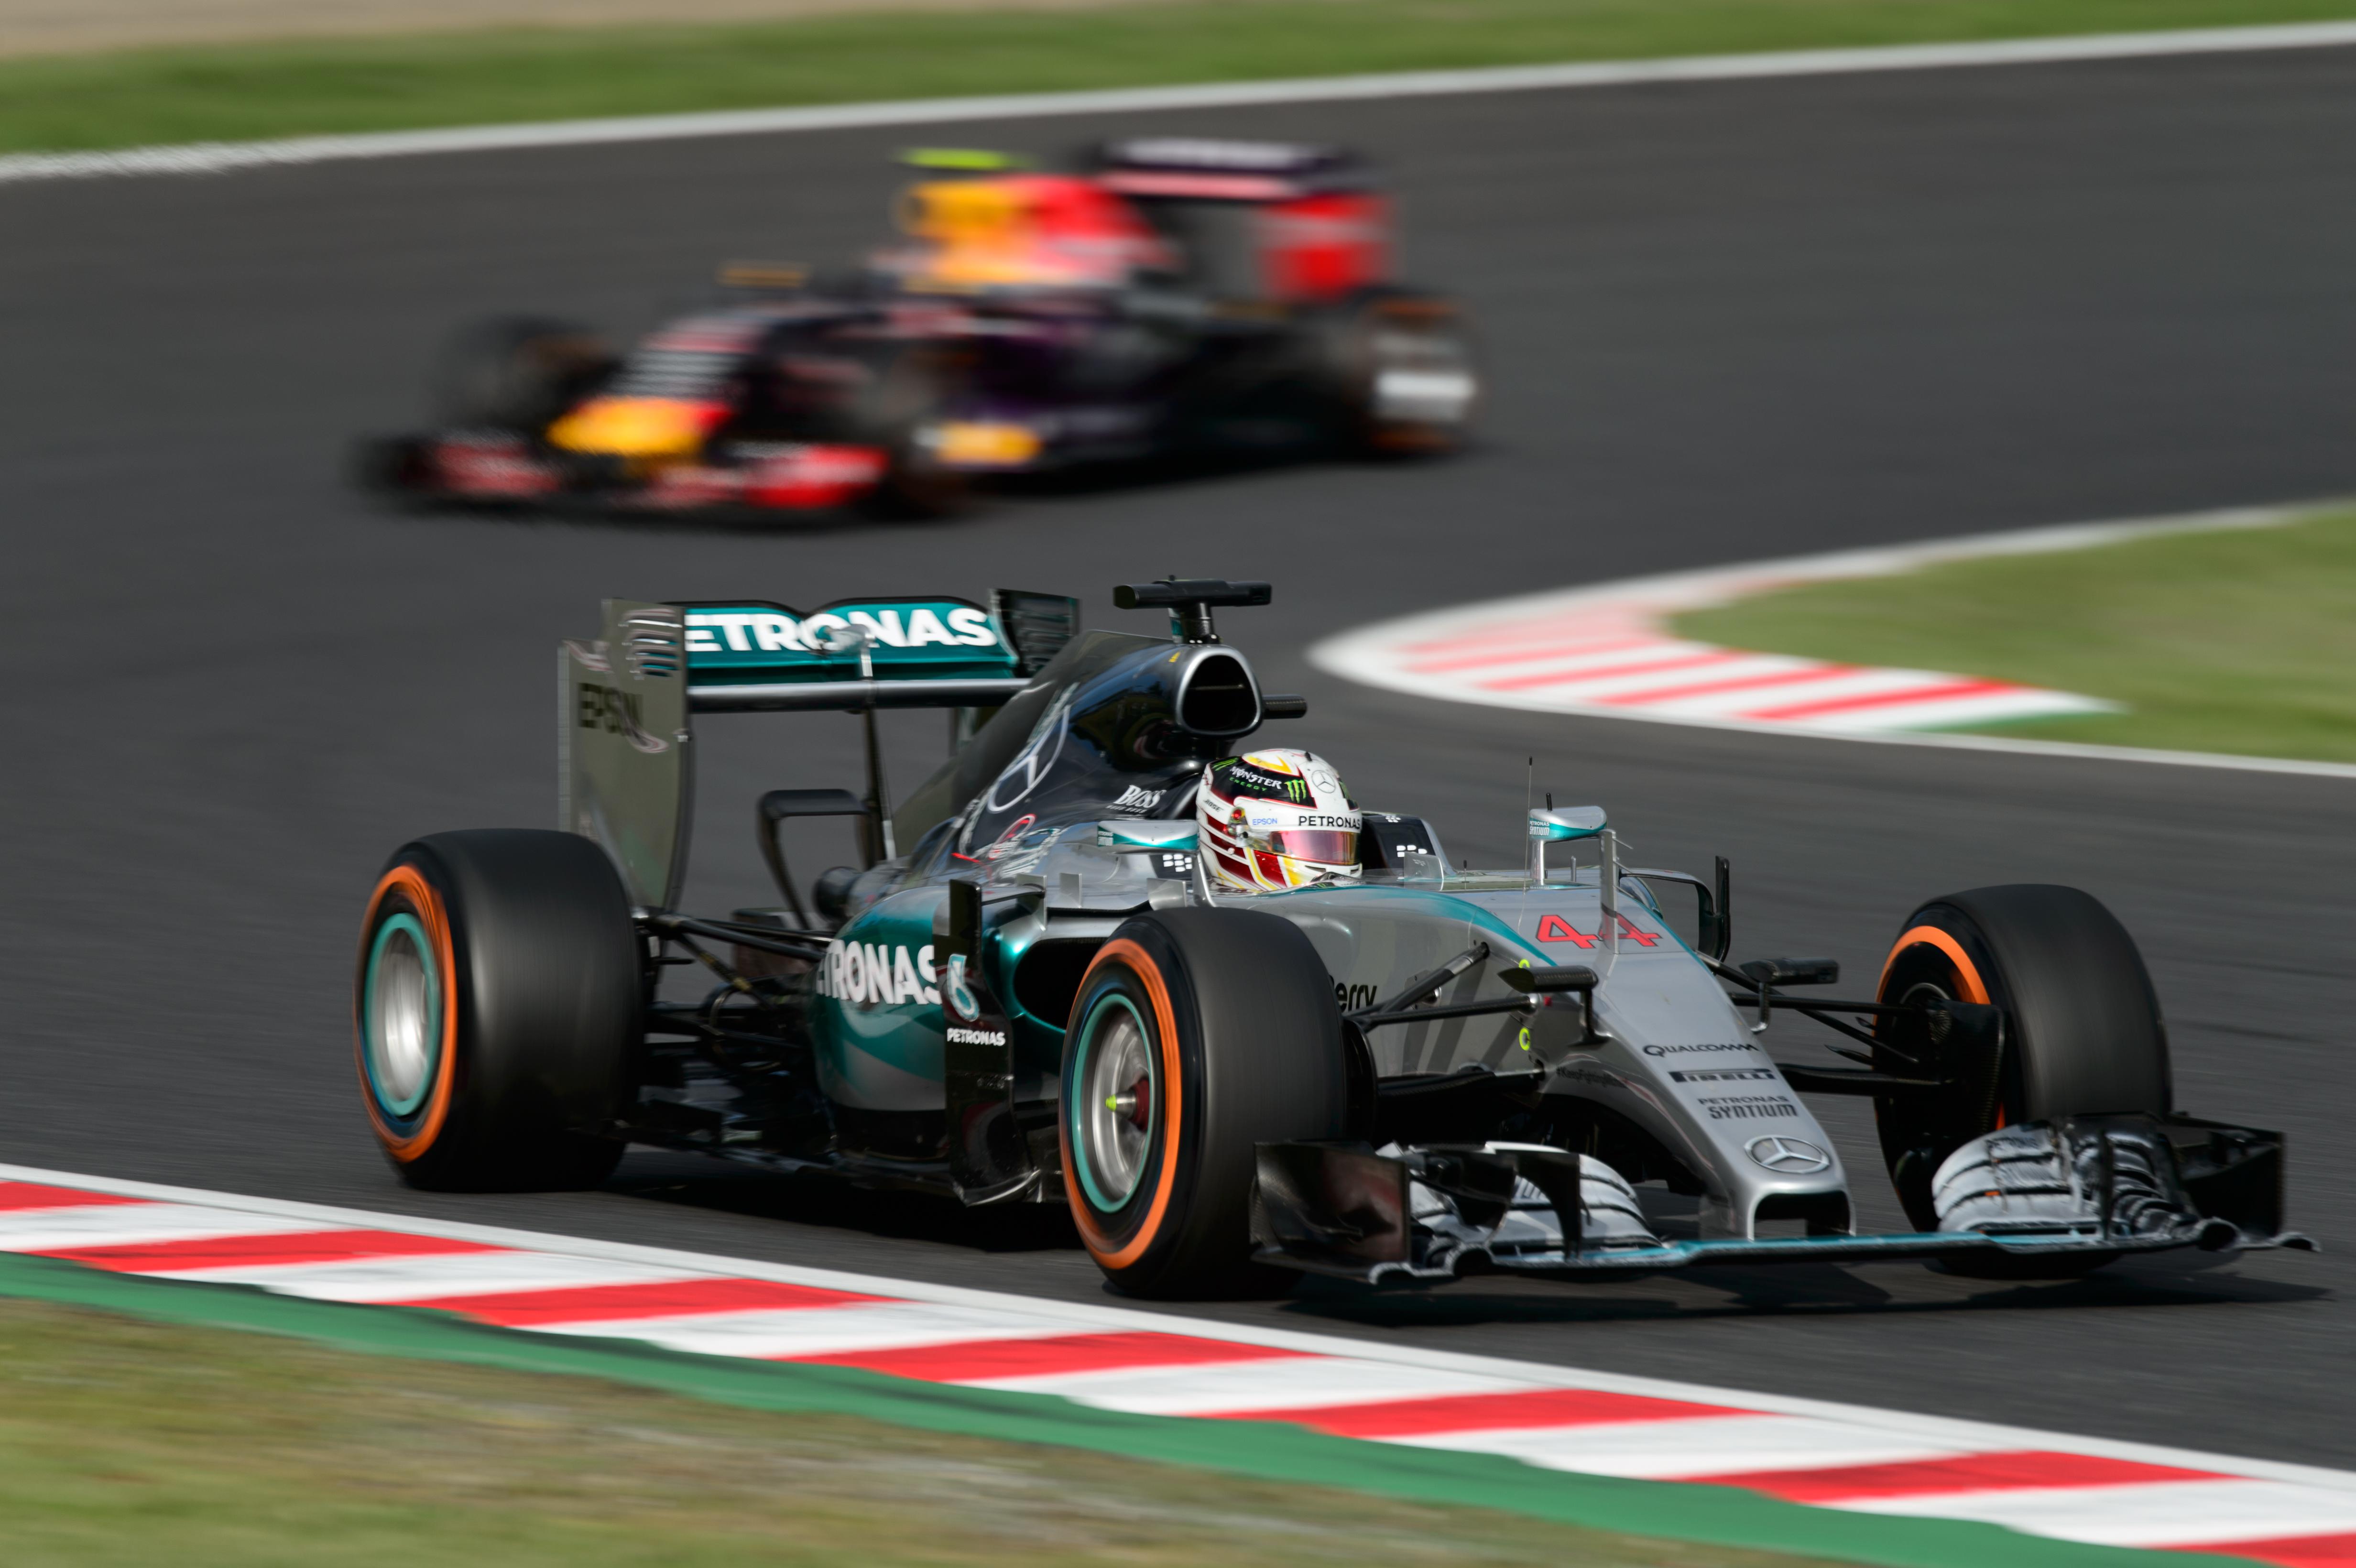 File No.44 - Lewis Hamilton - Mercedes AMG Petronas F1 Team  (21701103570).jpg 514bfb761bf